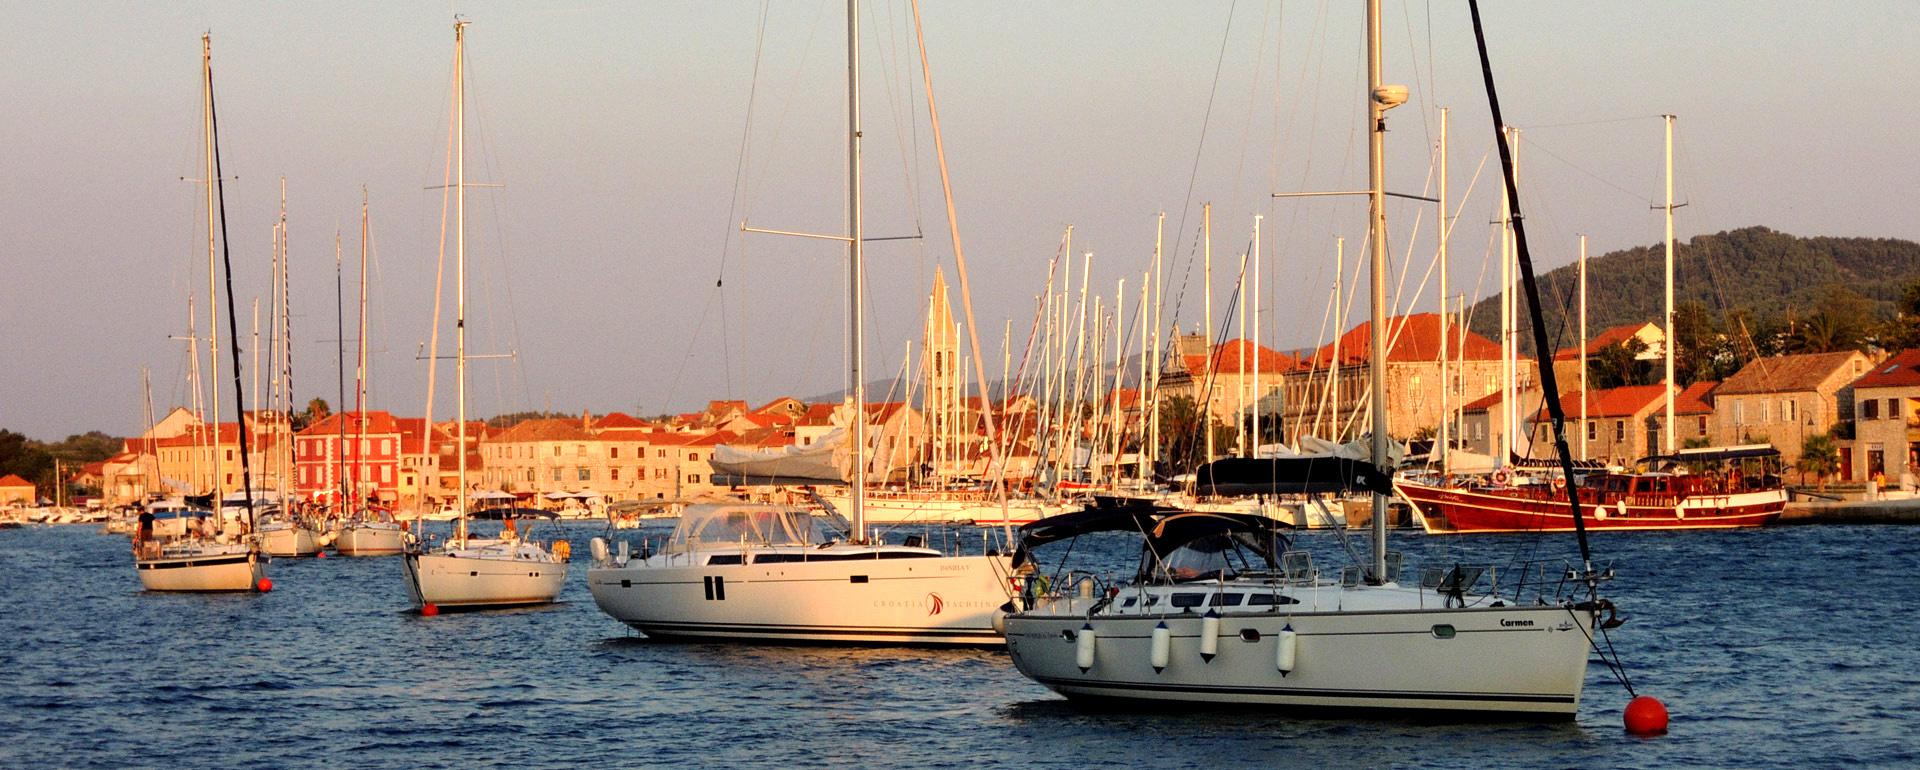 Stari Grad, Hvar island_Croatia.jpg